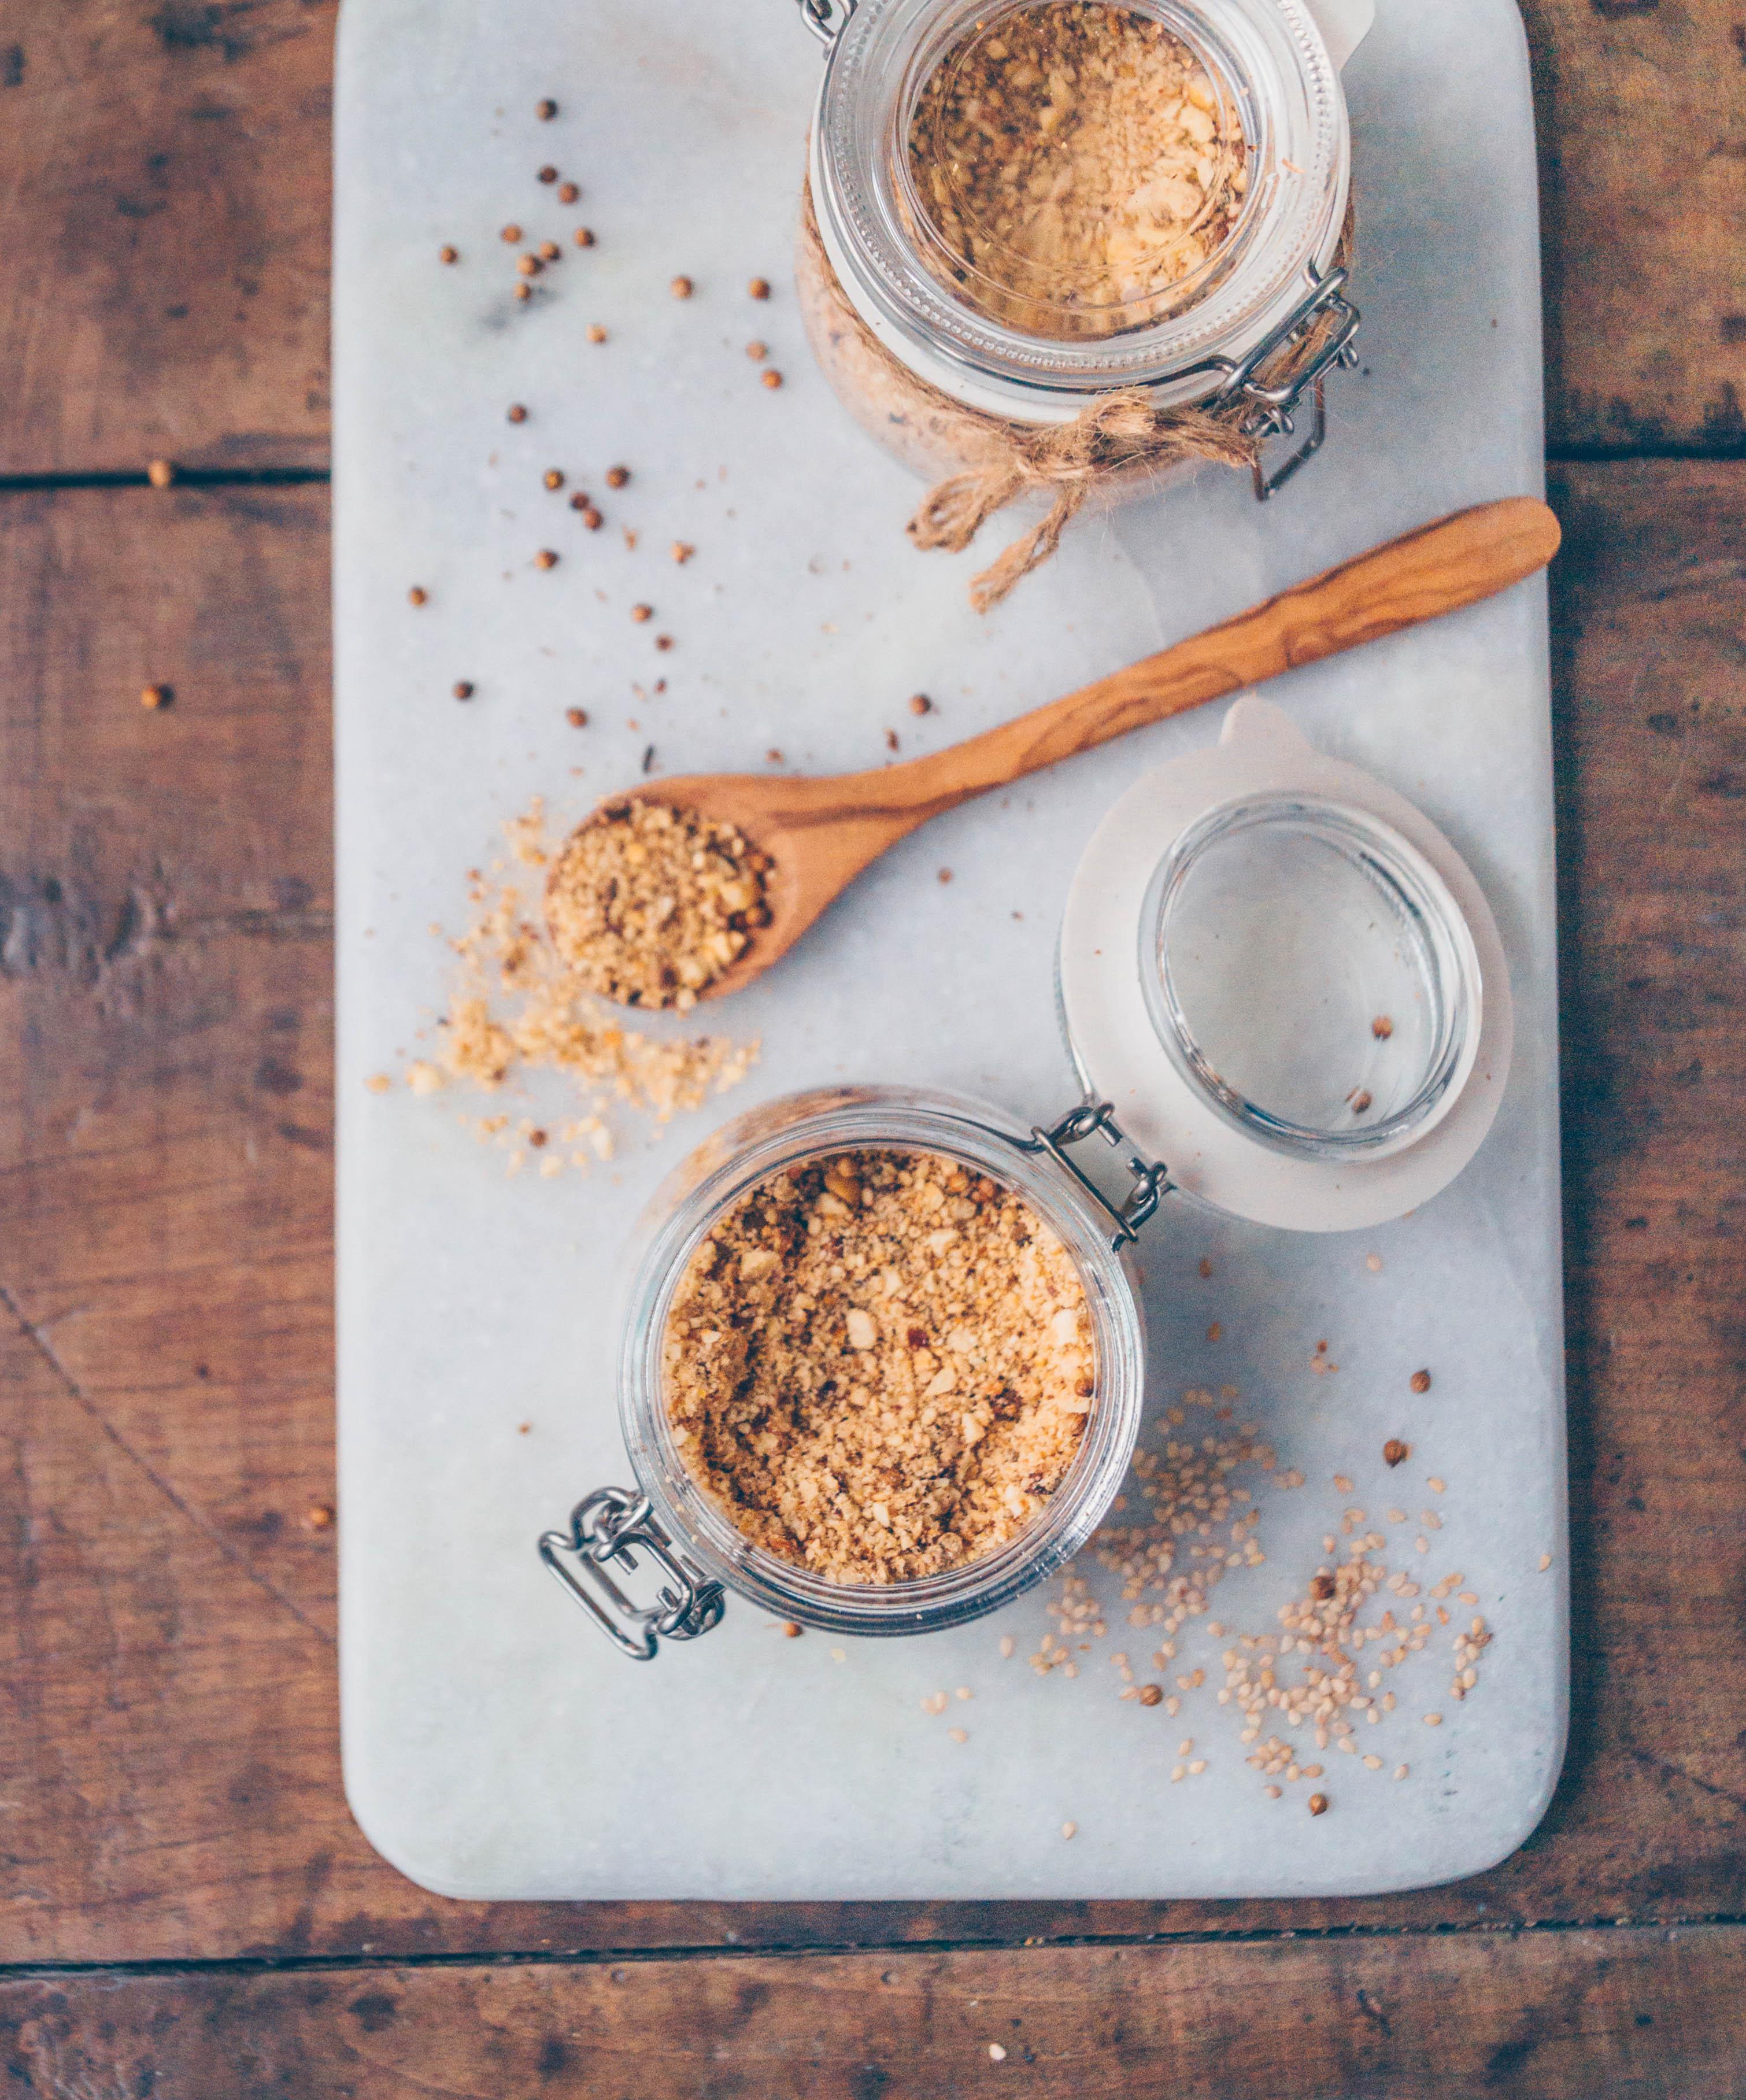 Basic dukkah recipe